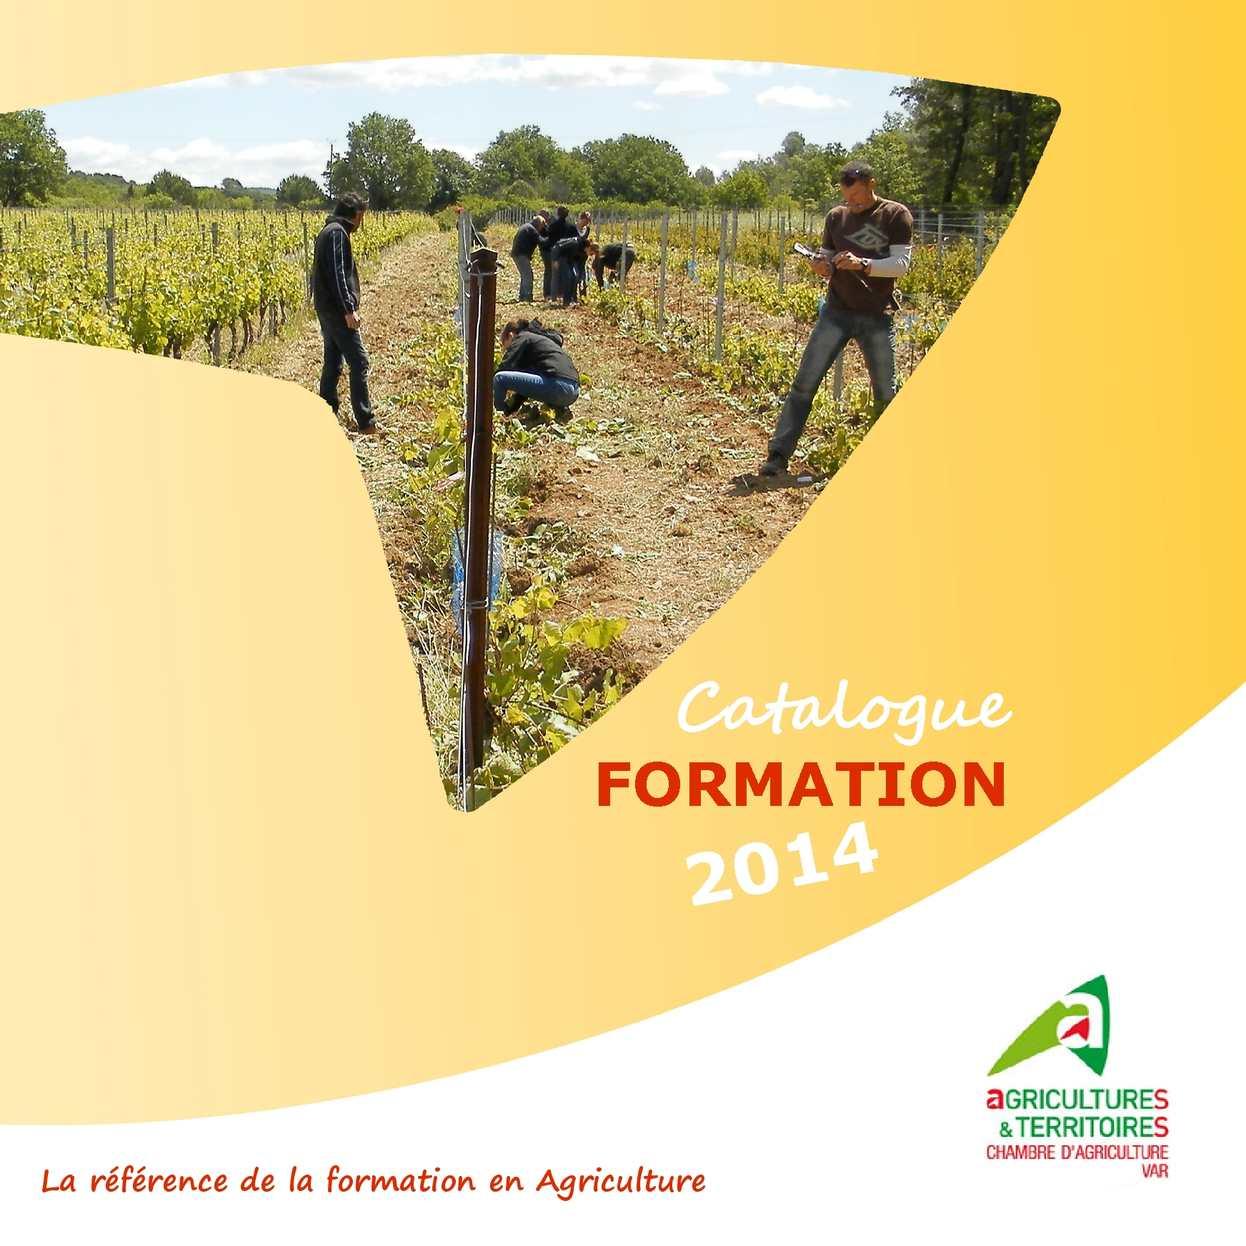 Calam o catalogue formation 2014 chambre d 39 agriculture for Chambre d agriculture 35